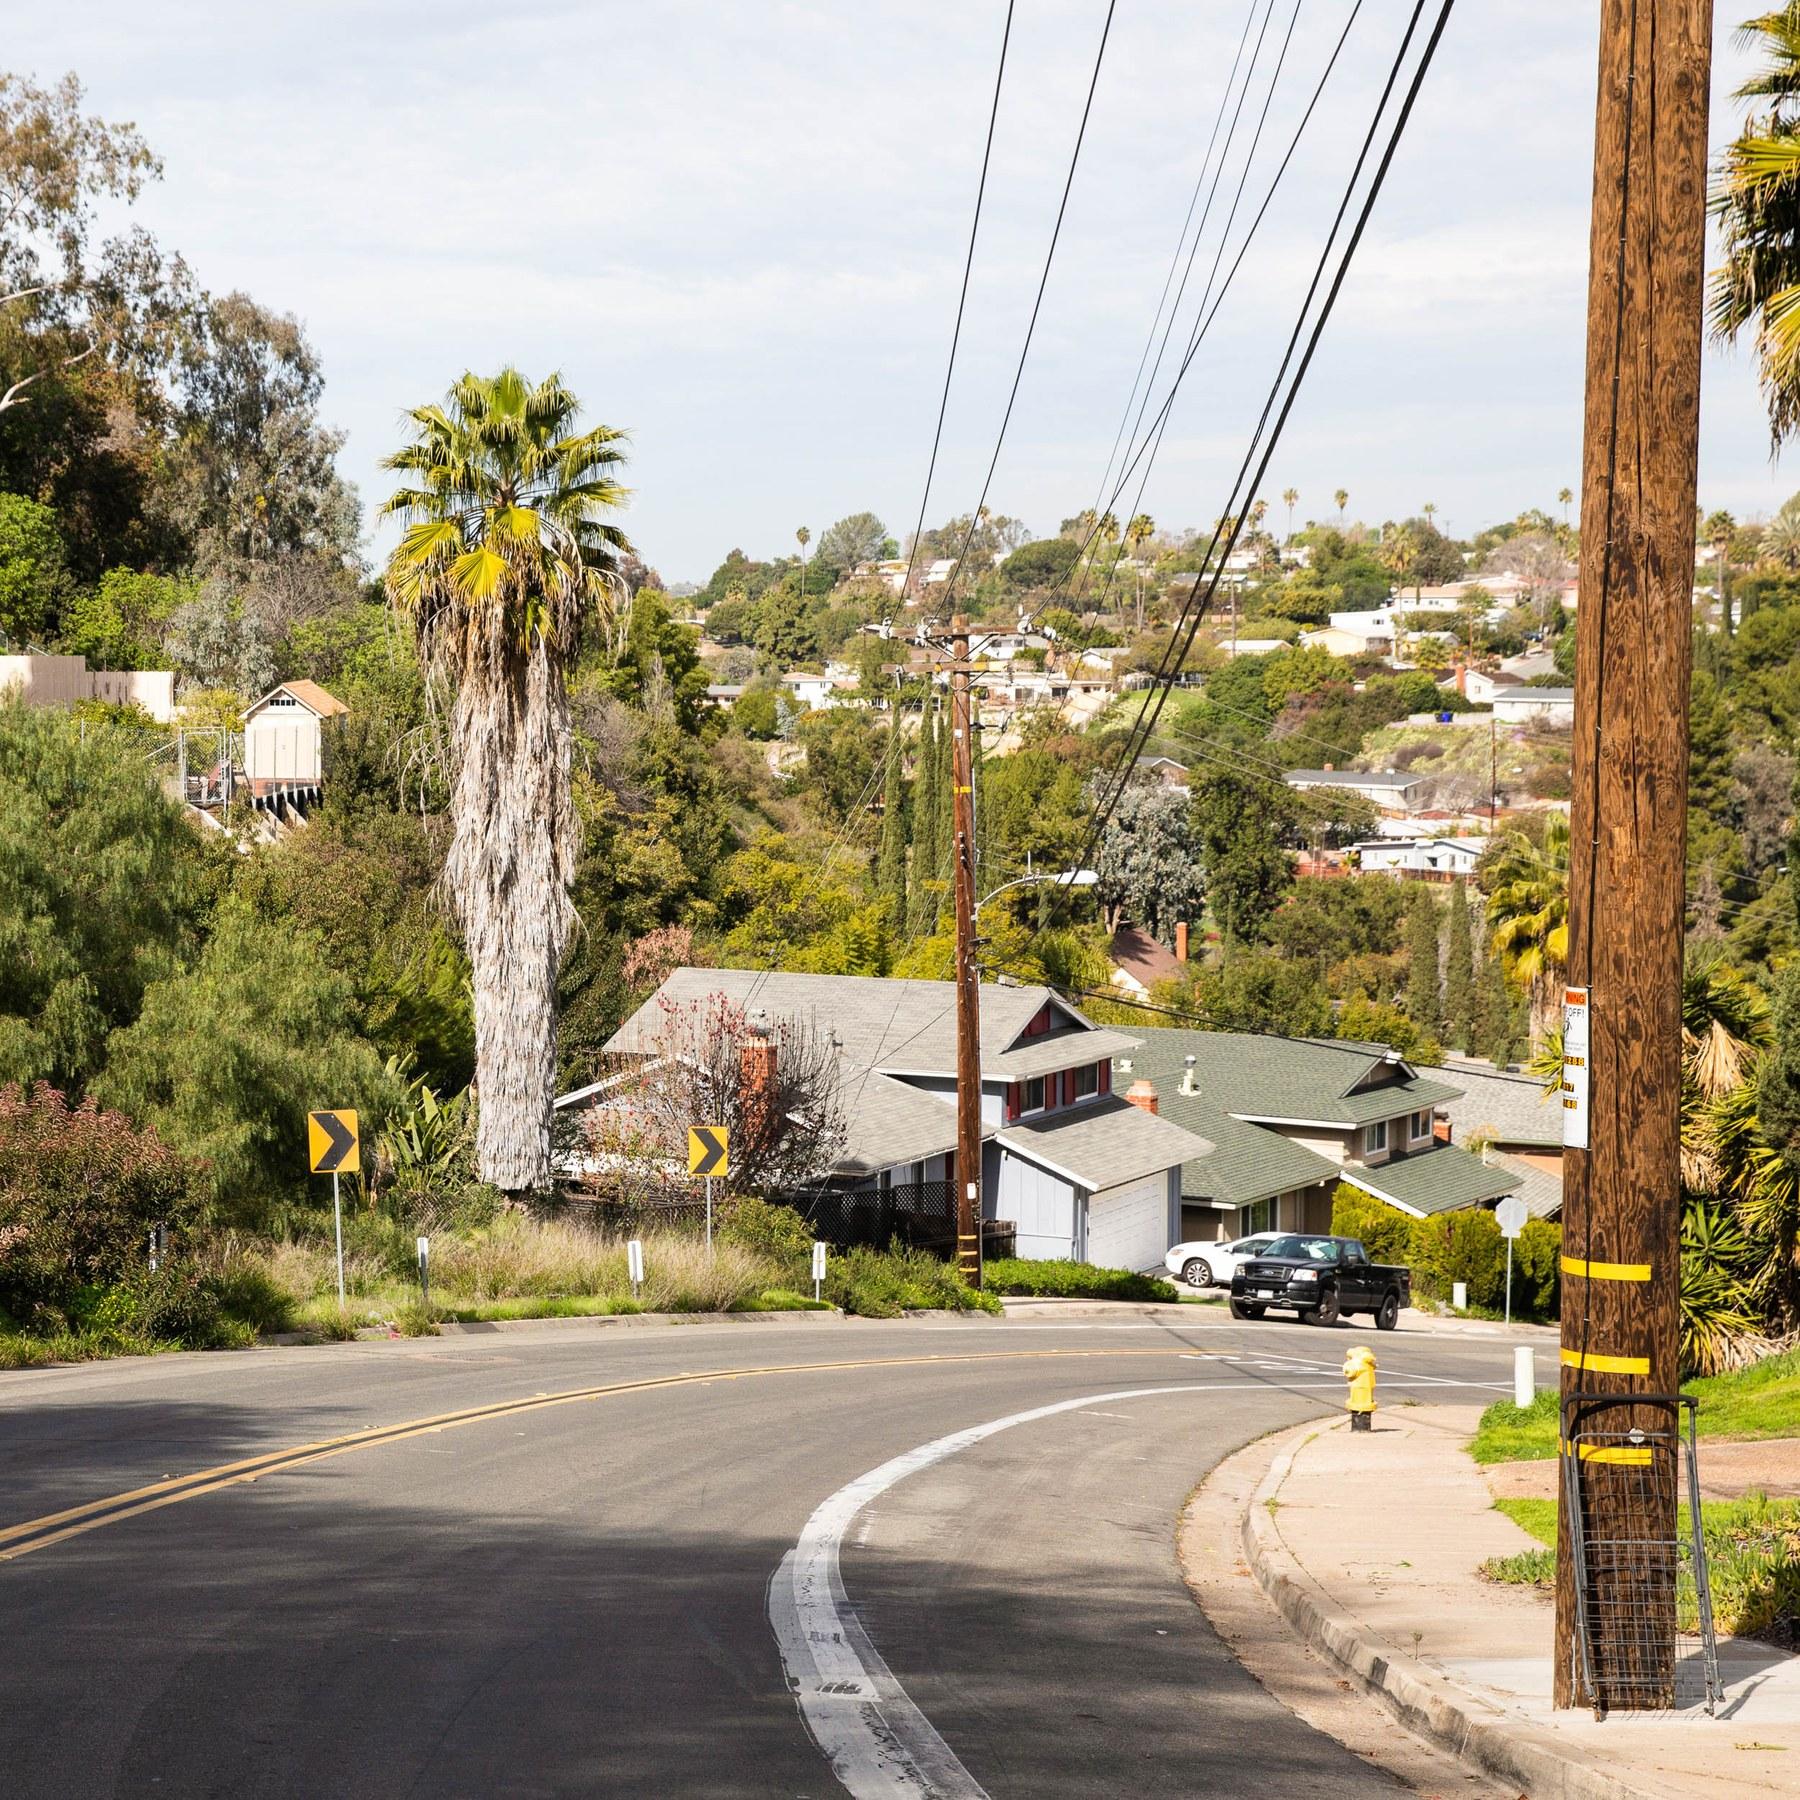 College West, San Diego CA - Neighborhood Guide